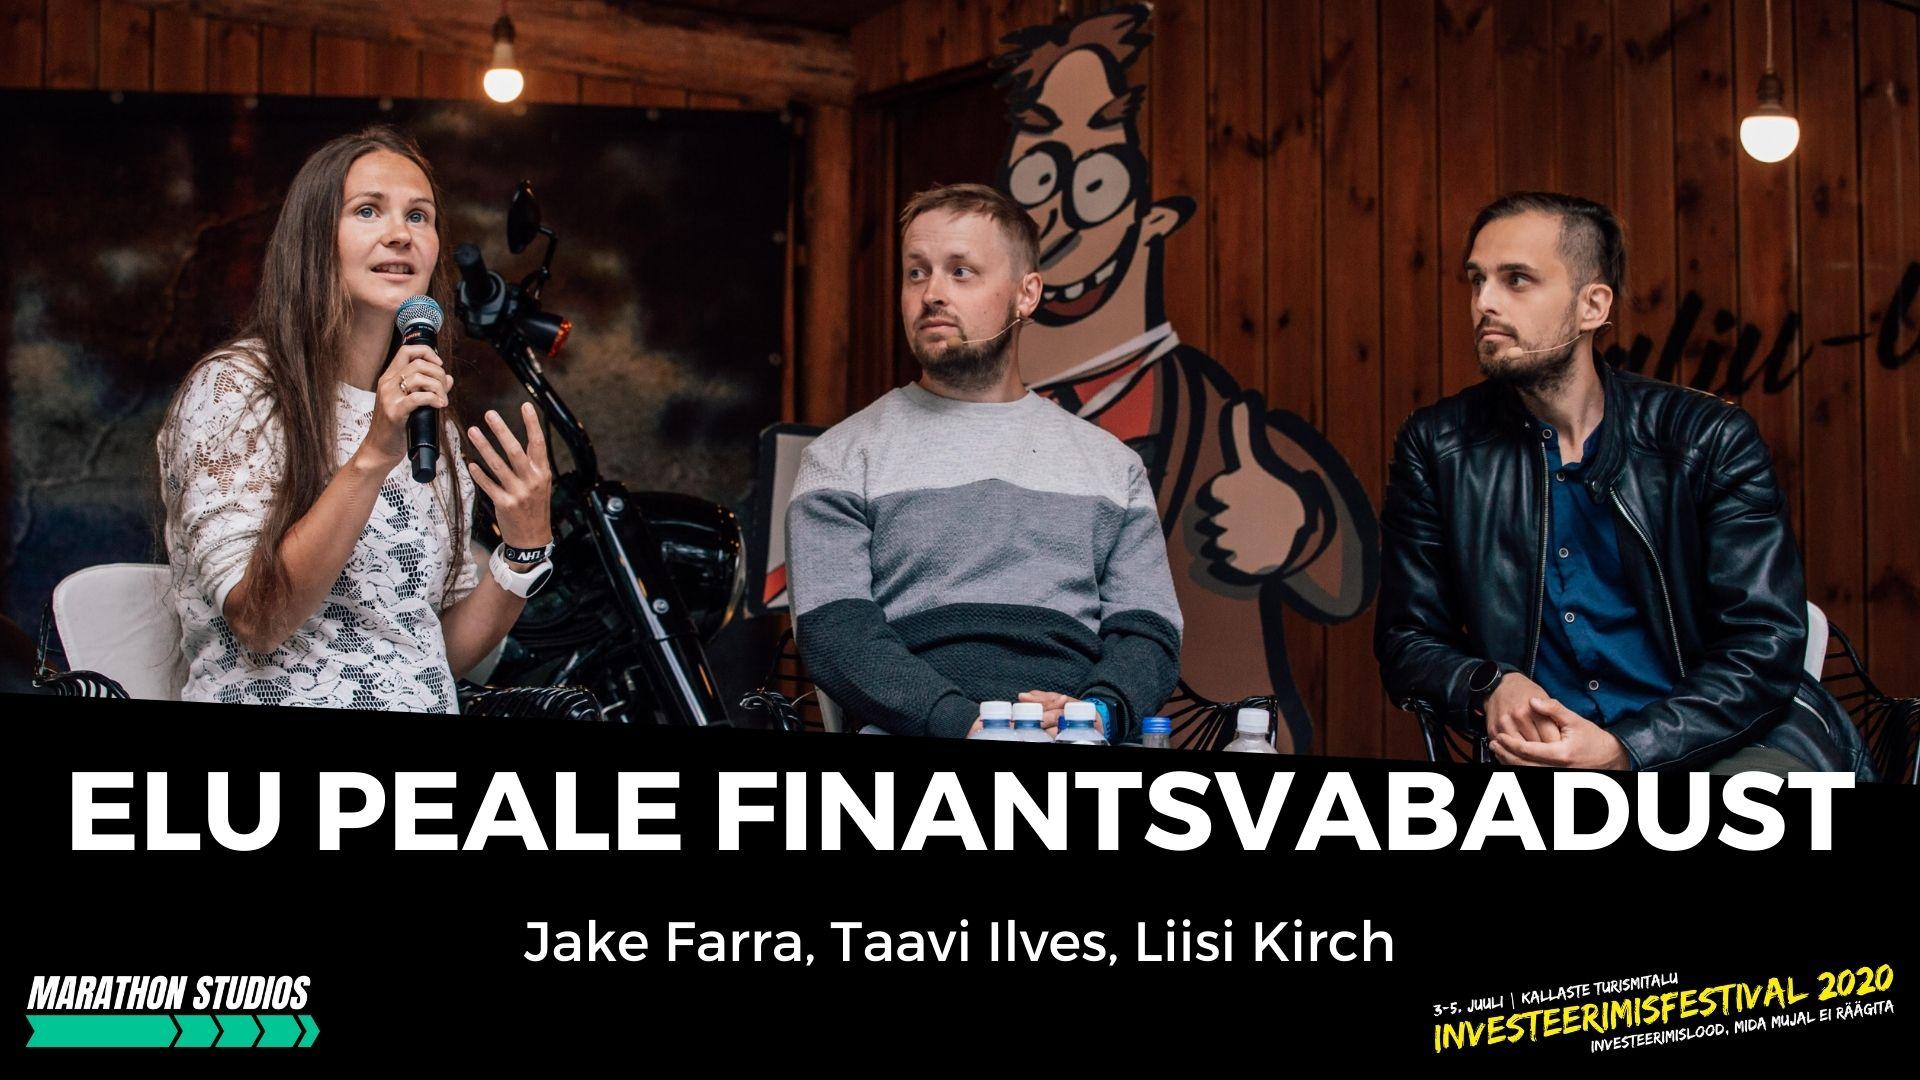 Elu peale finantsvabadust - Jake Farra, Taavi Ilves, Liisi Kirch